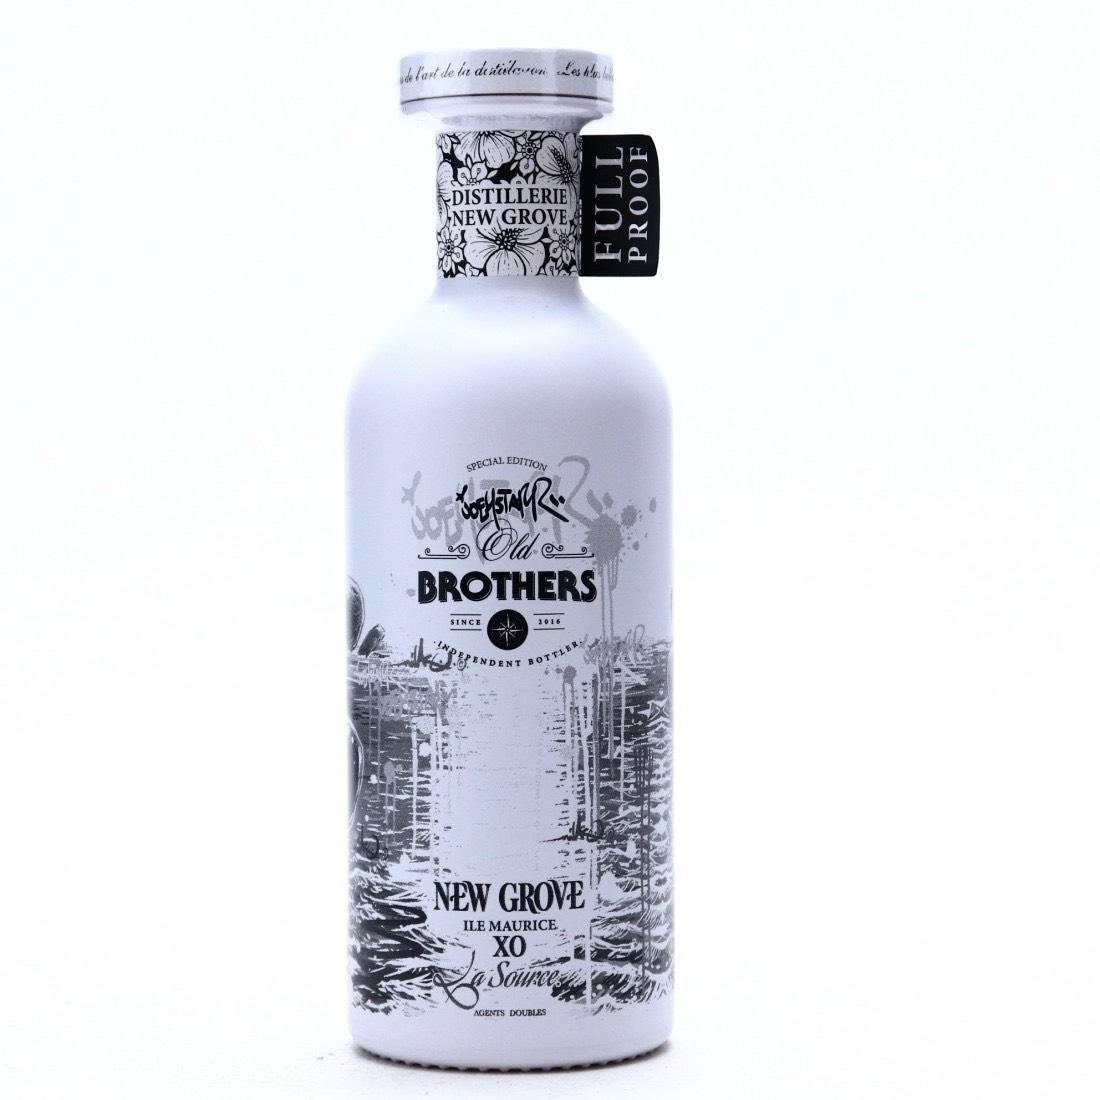 Bottle image of New Grove Joeystarr XO